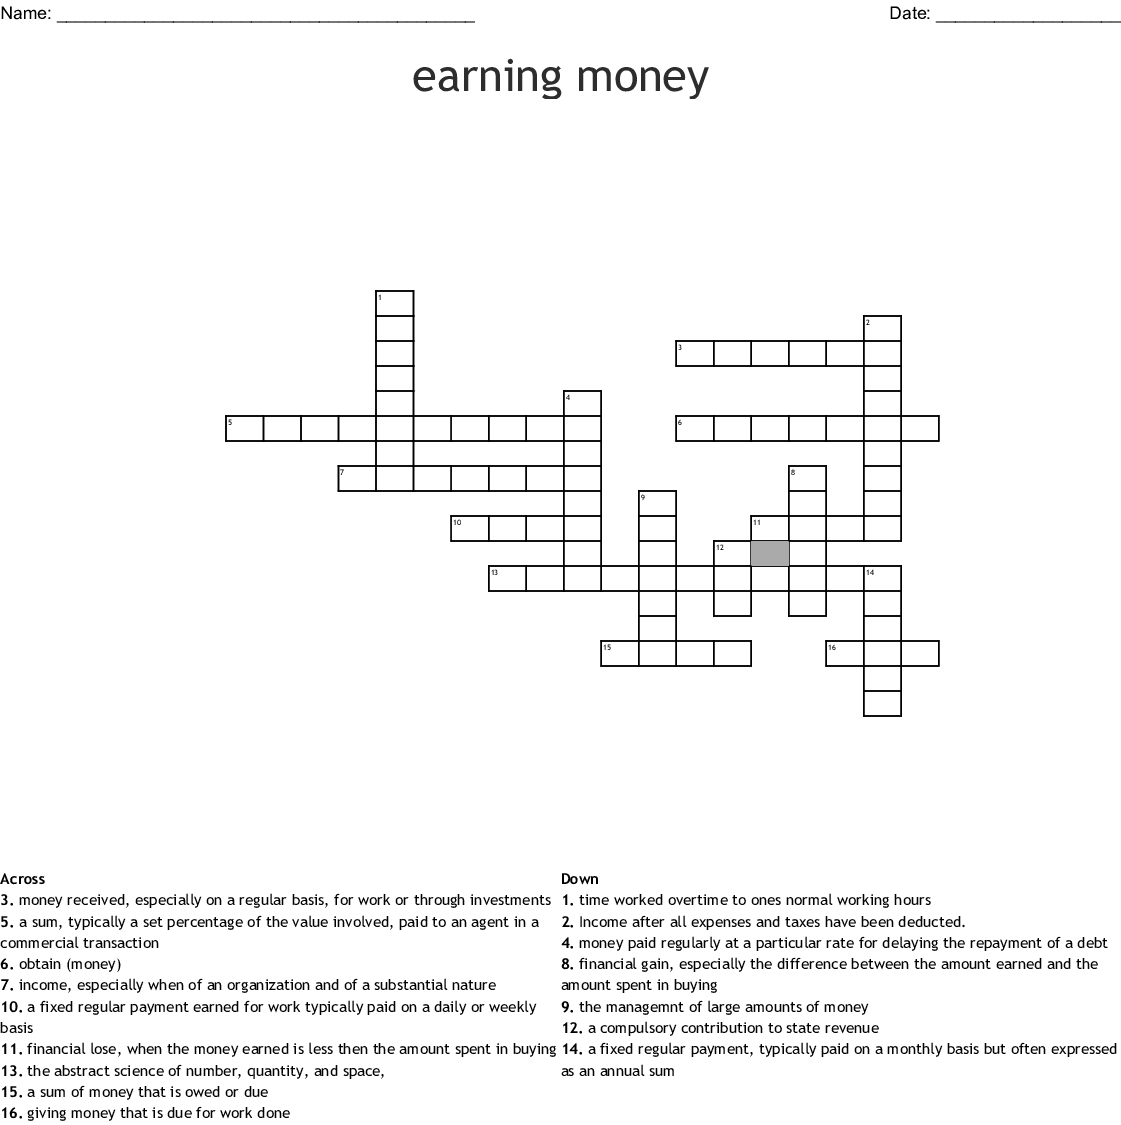 Earning Money Crossword Wordmint